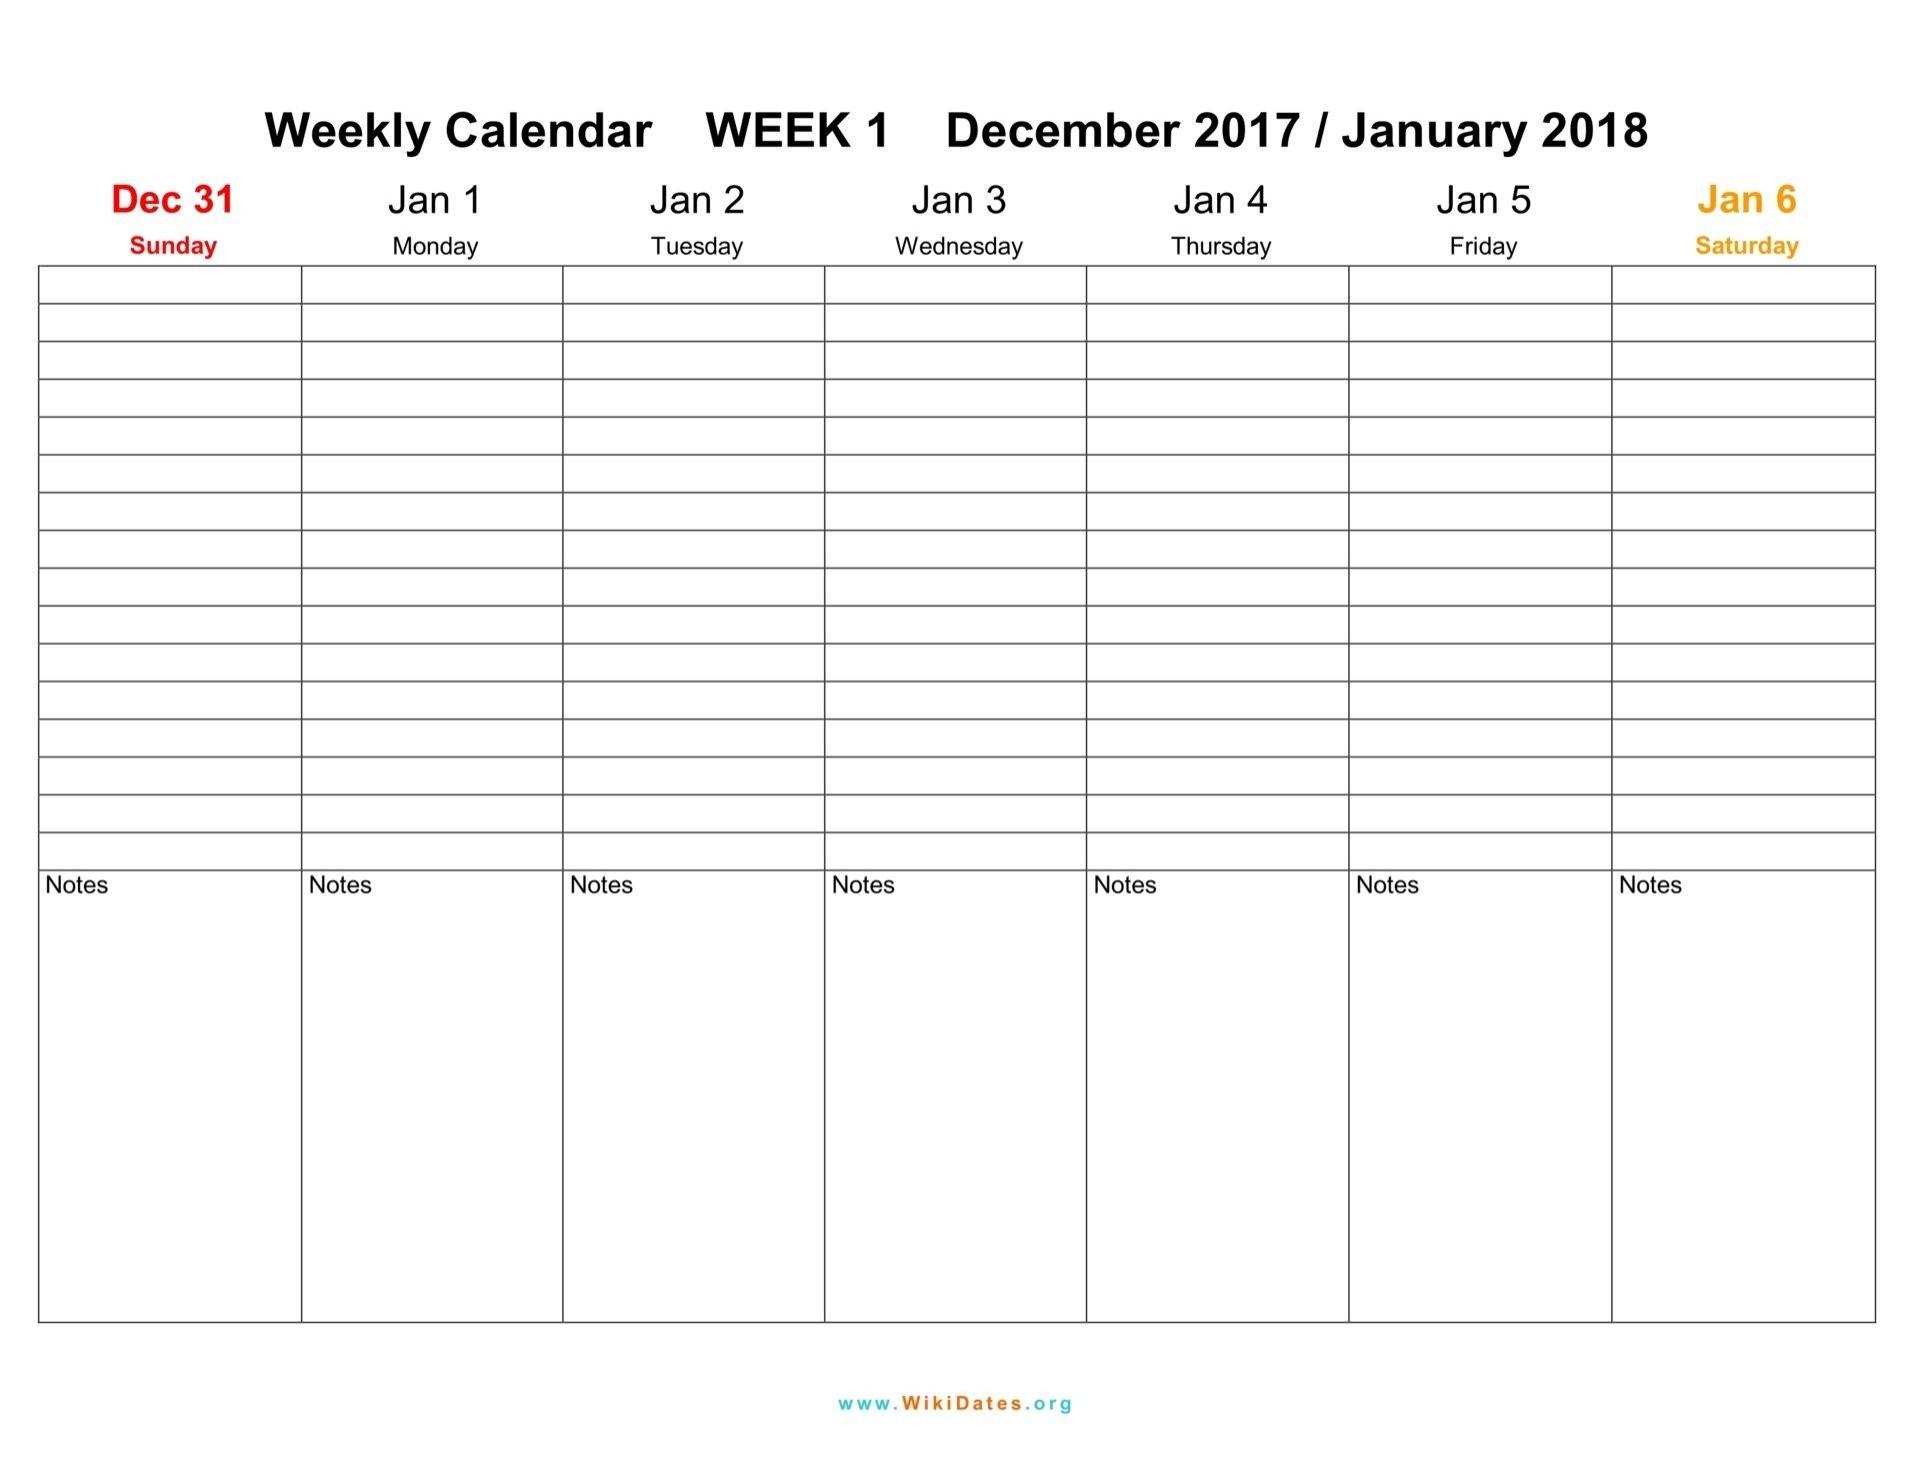 007 Breathtaking Free Printable Weekly Calendar Template 2018 Image 1920